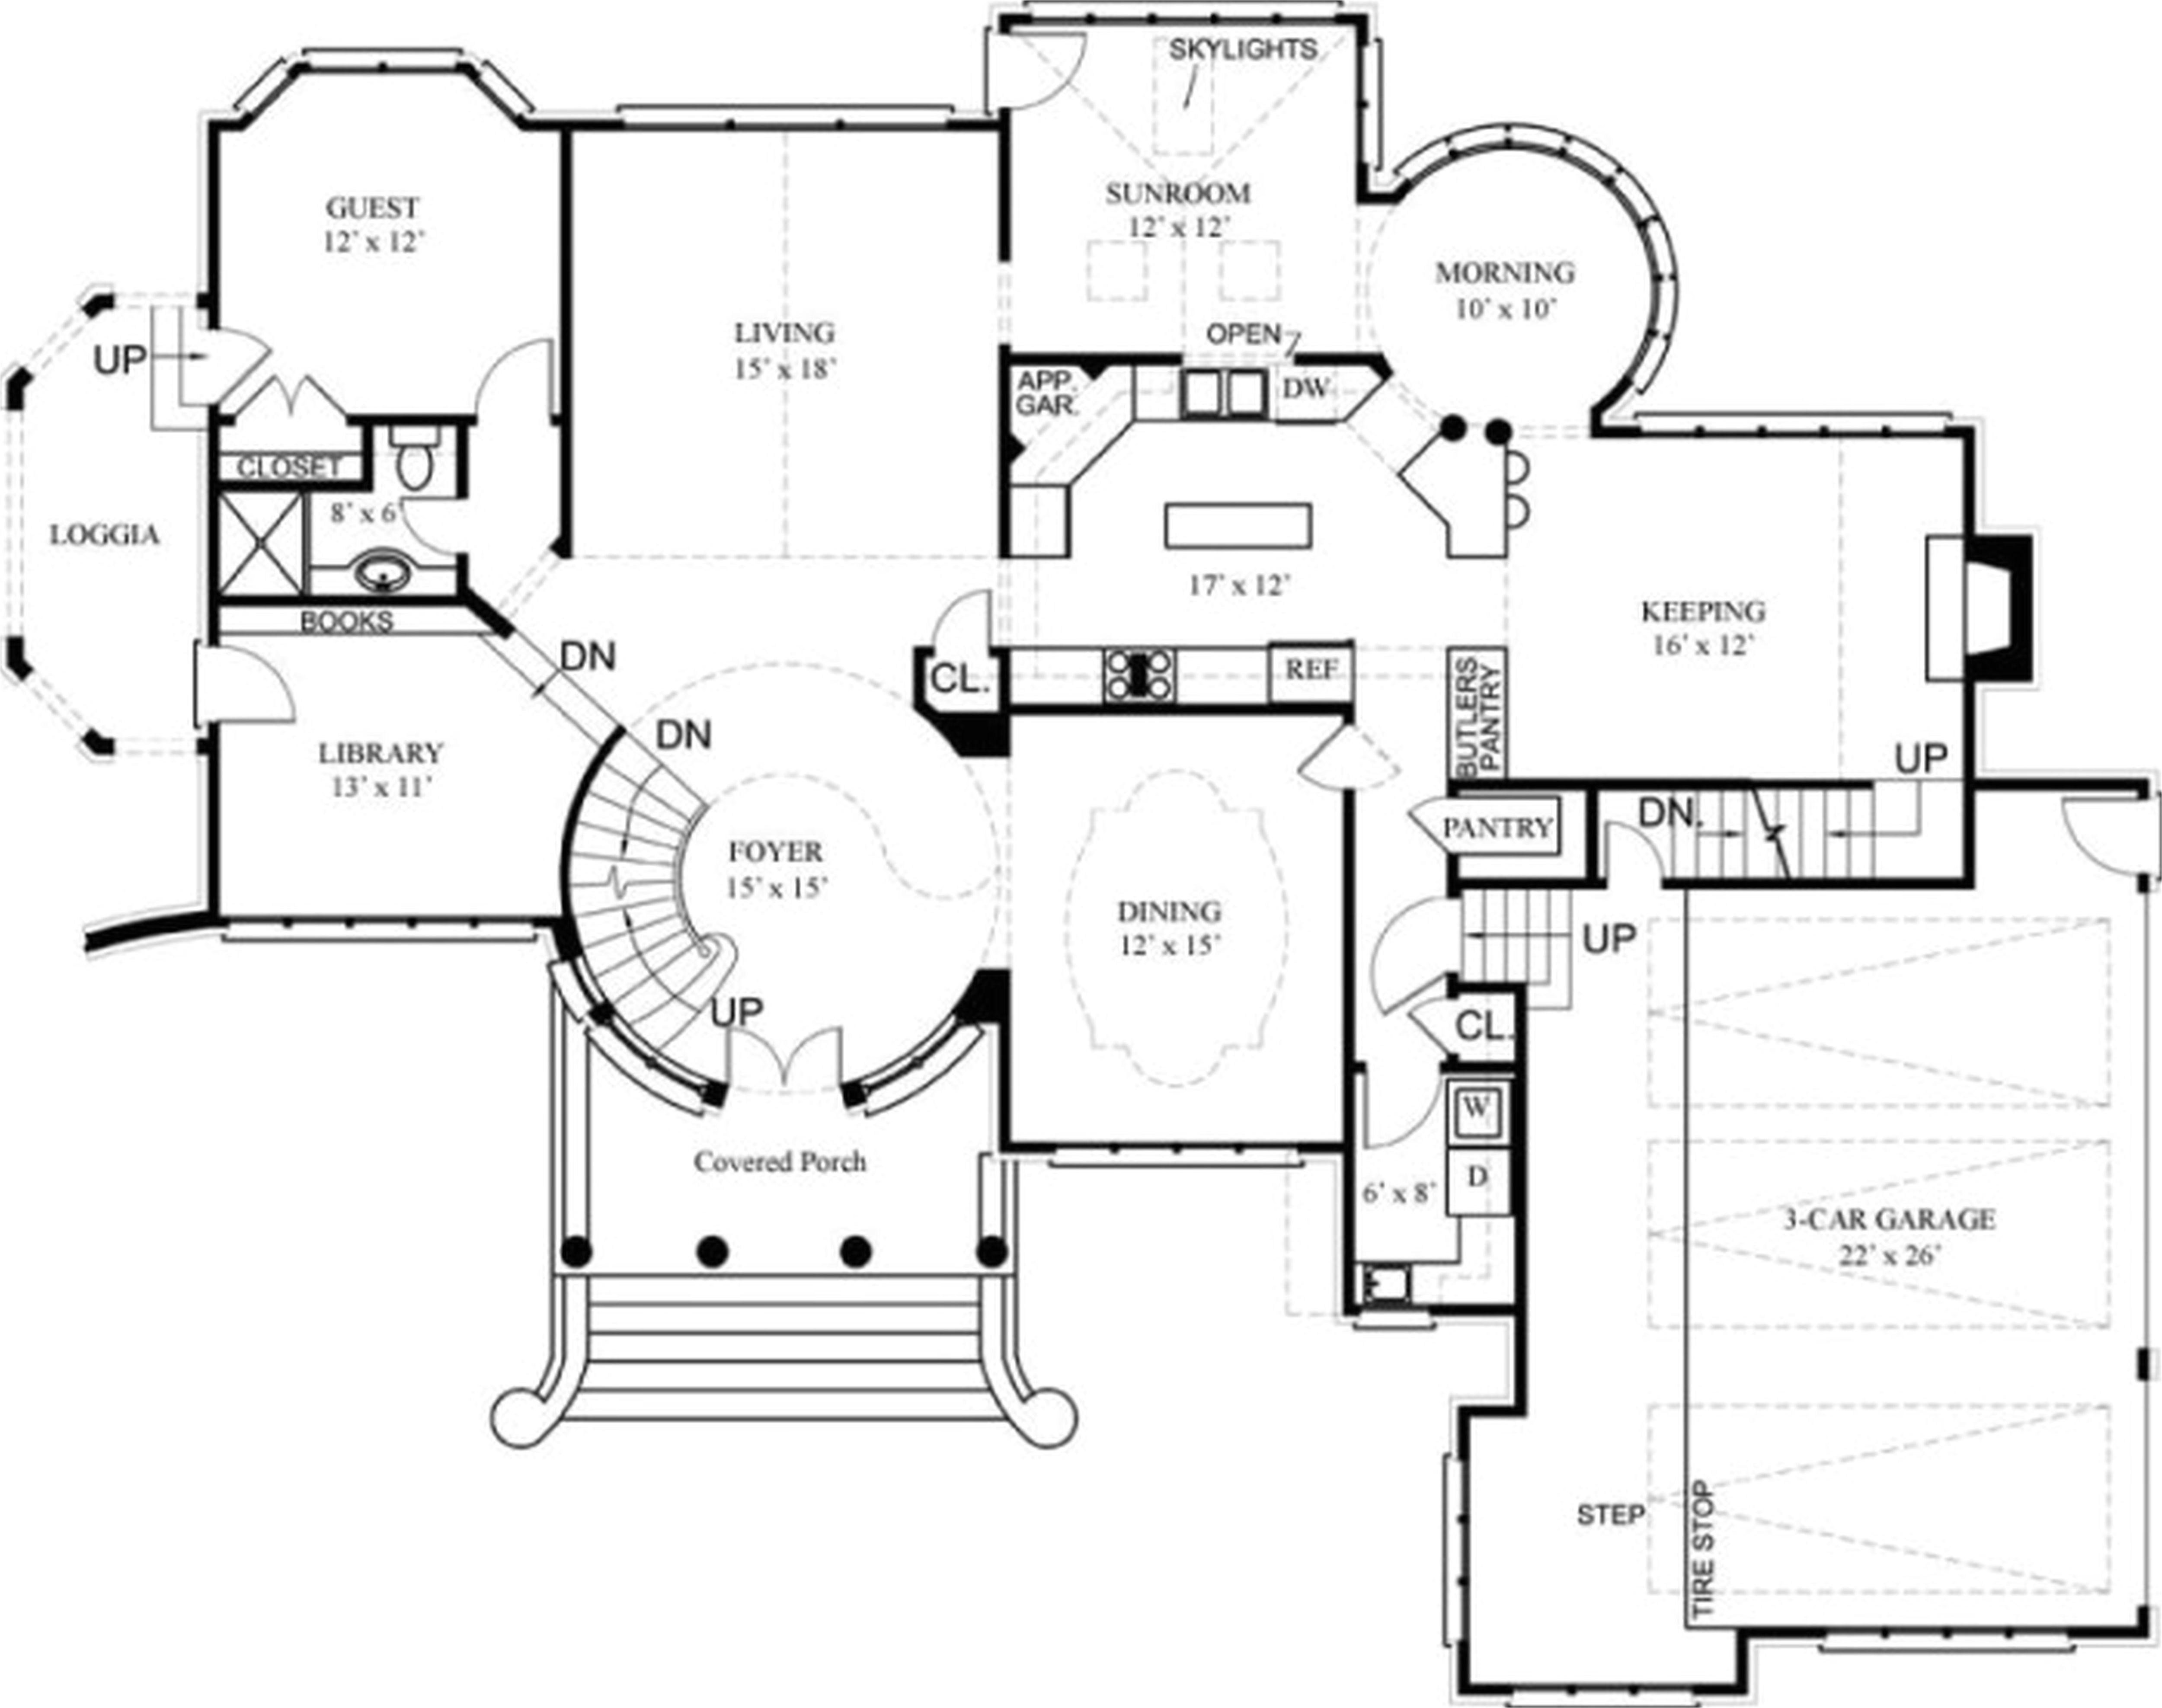 floor plans castle tritmonk pictures of home interior flooring design idea online templates residential floorplanning department